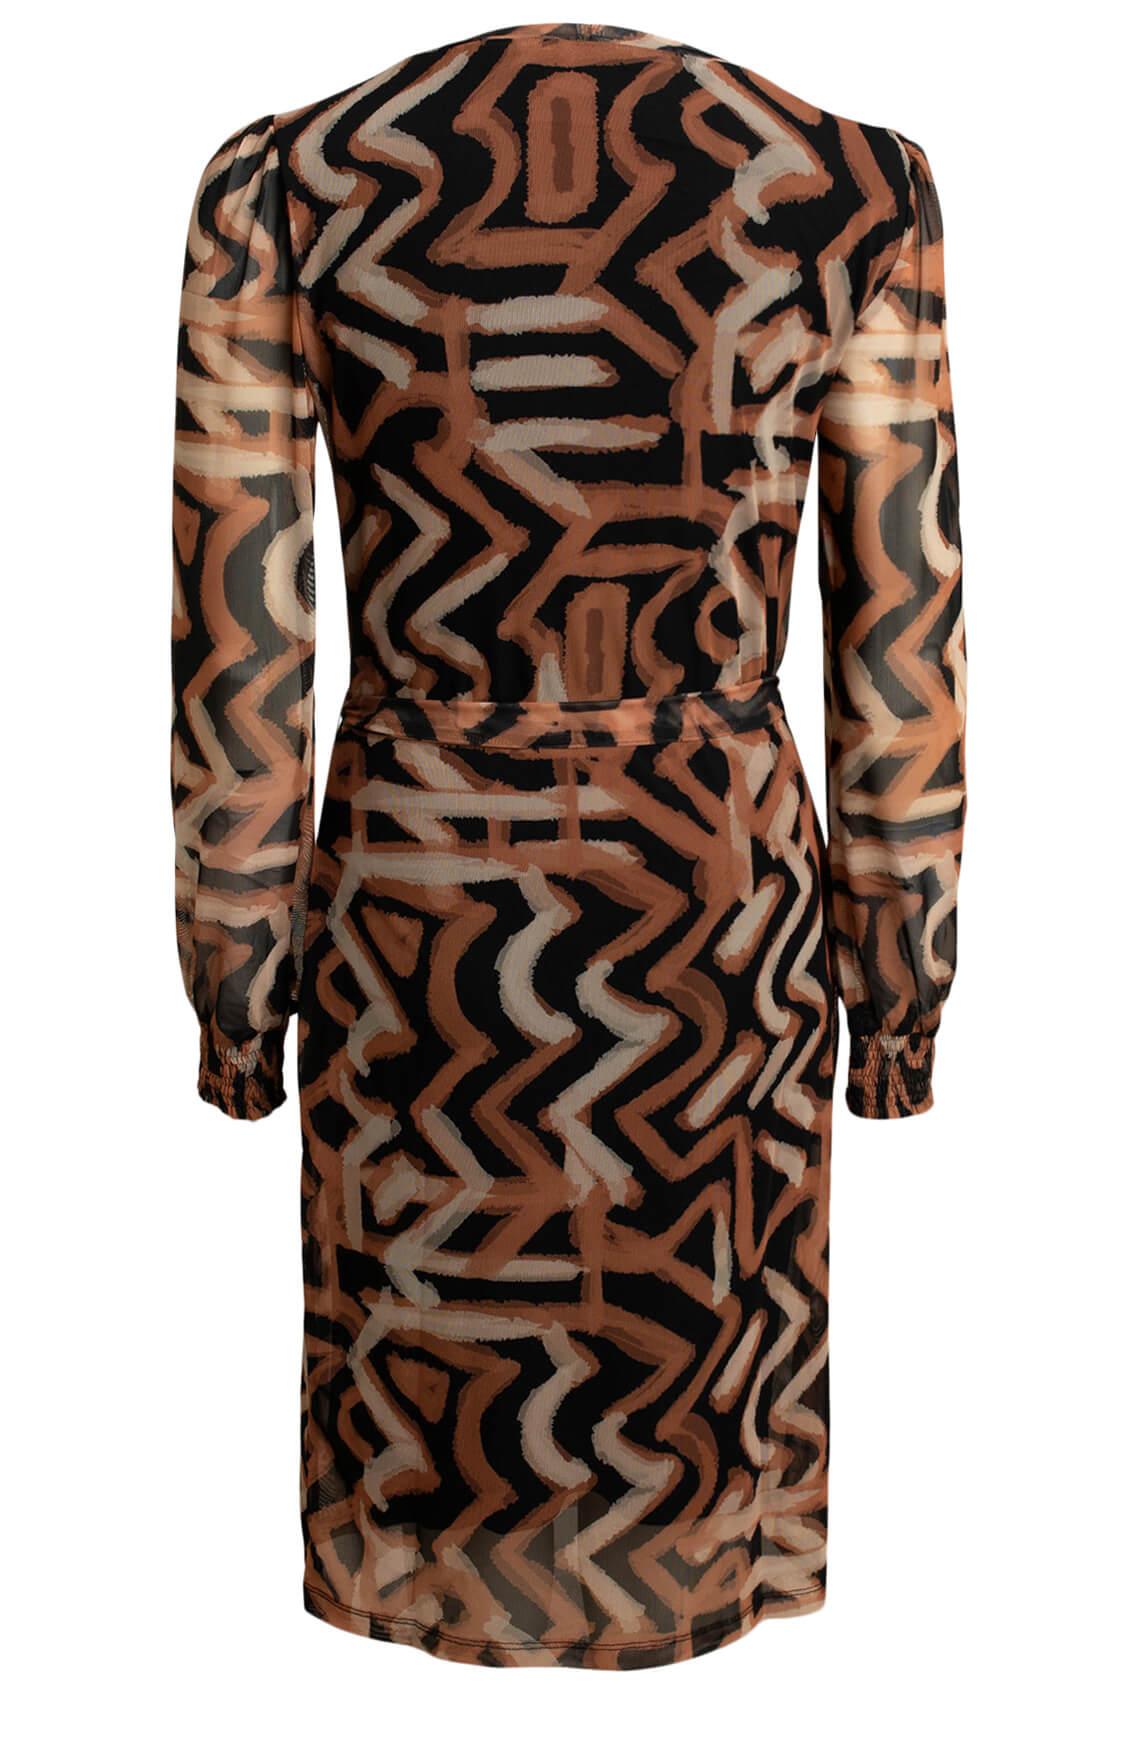 Anna Dames Mesh jurk Oranje